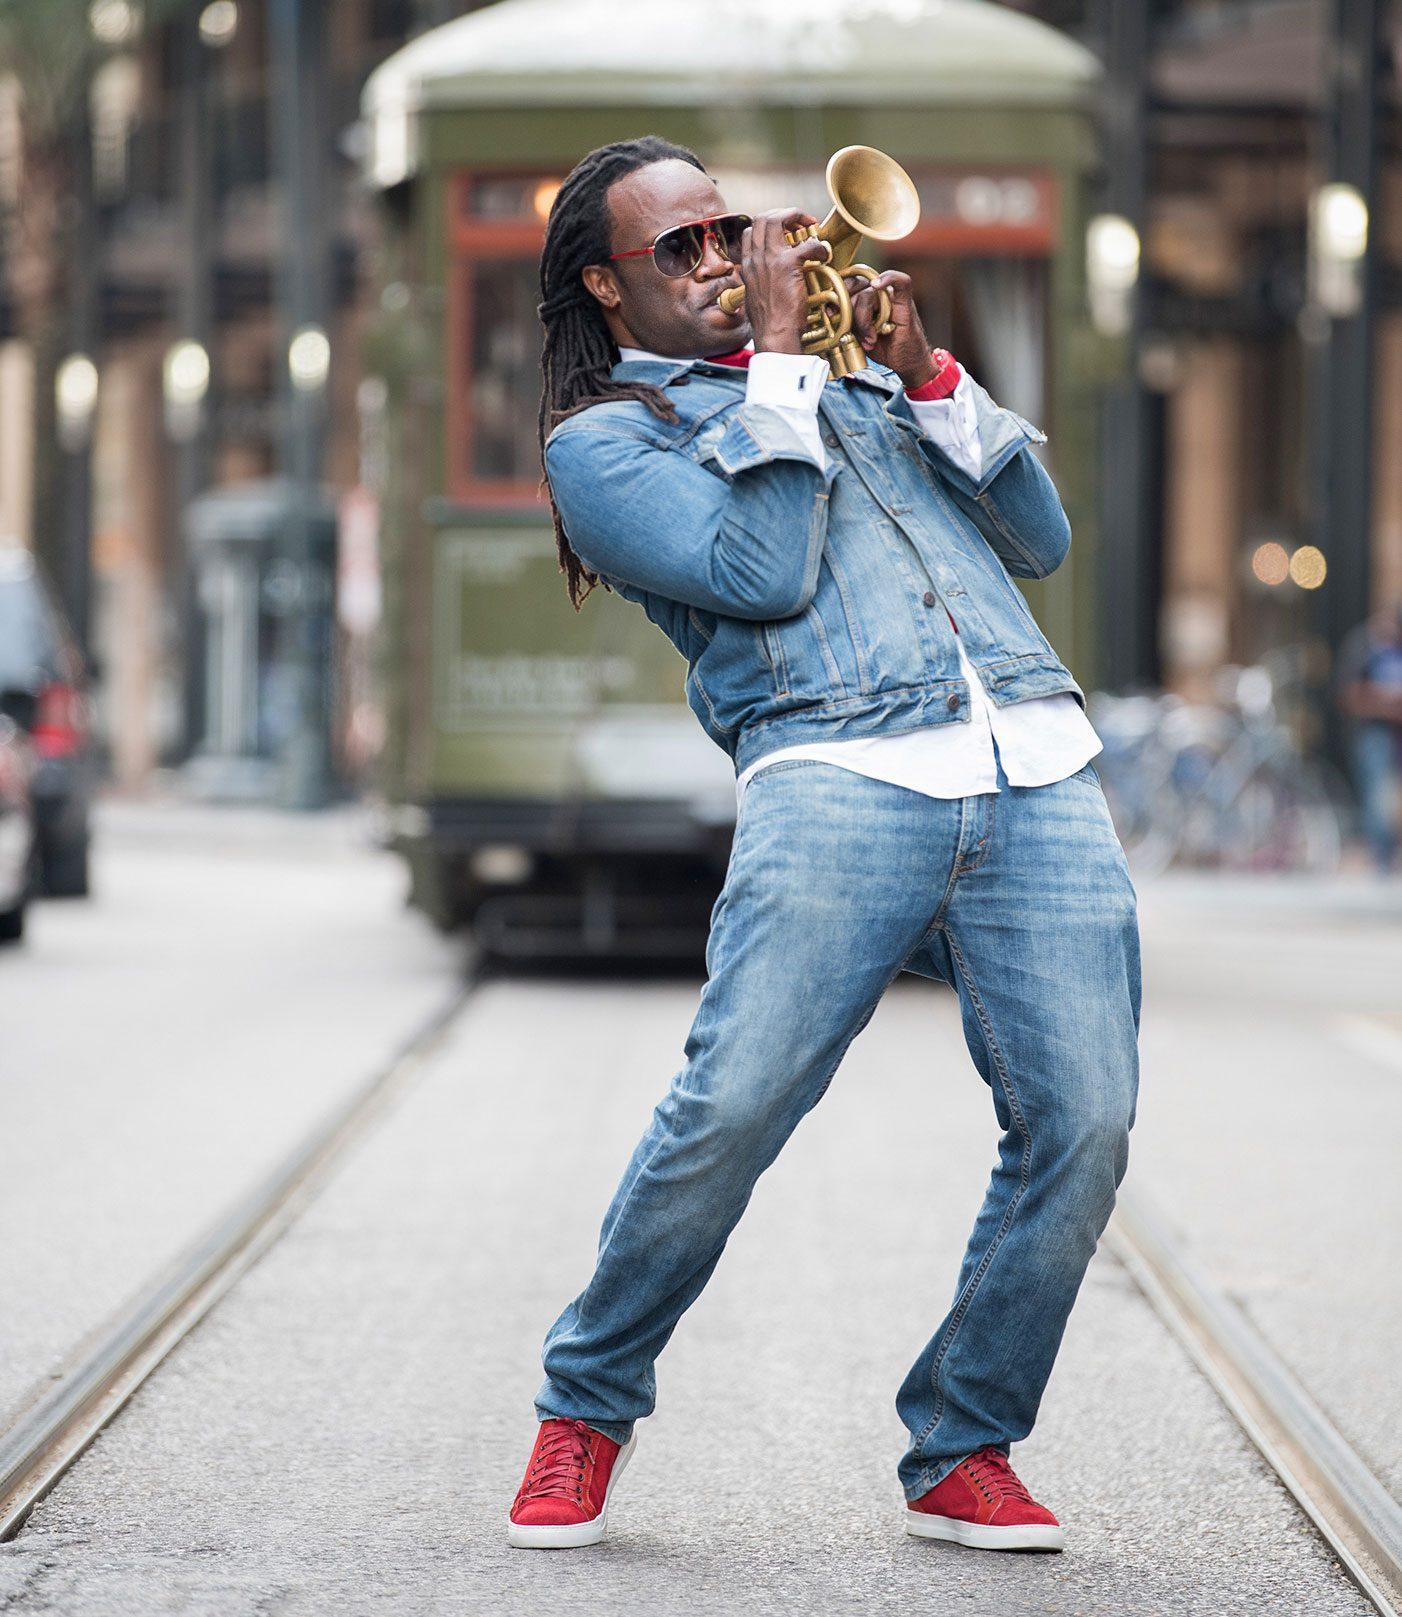 Shamarr Allen playing the trumpet